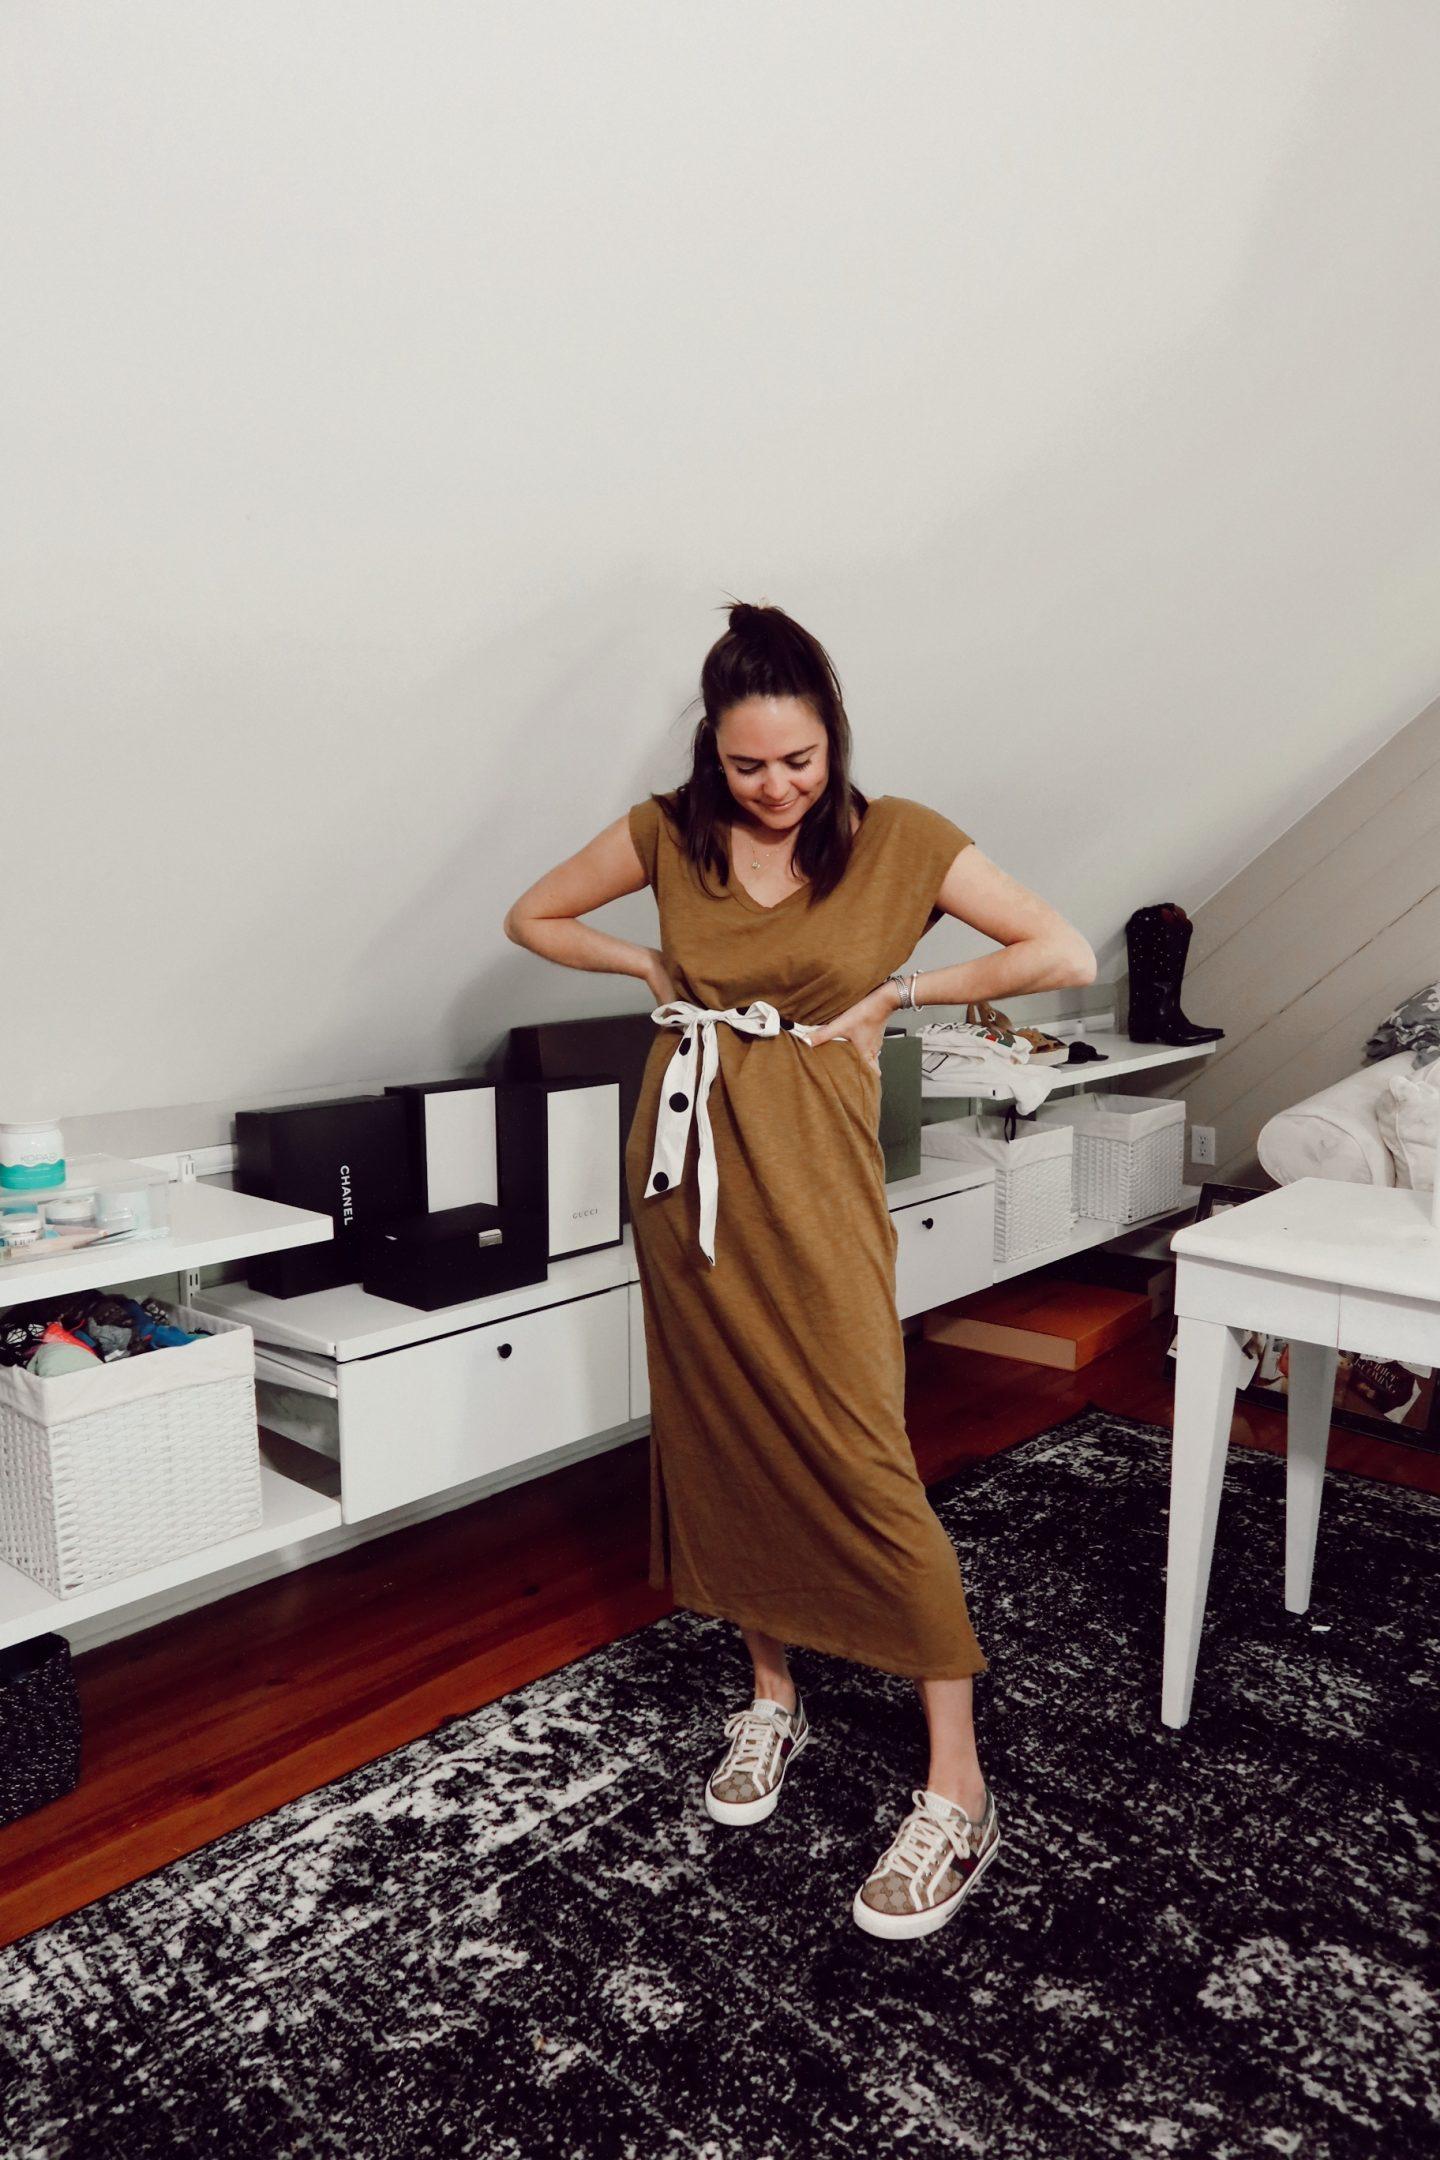 target style dress rebecca piersol